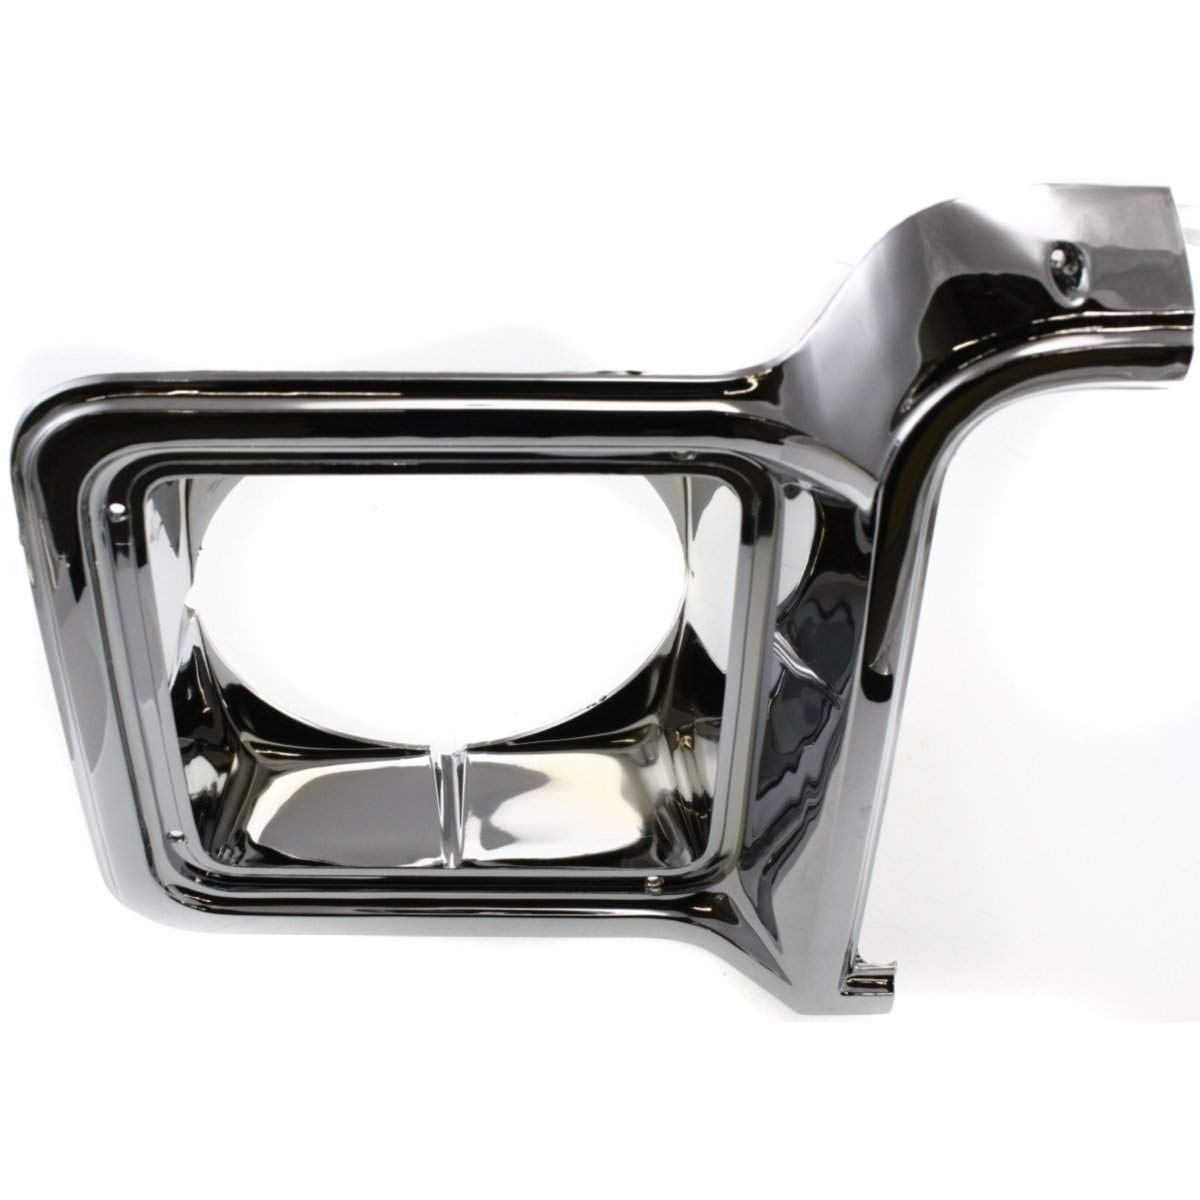 New Head light Headlight Door Headlamp Bezel Driver Left Side Chevy Blazer LH